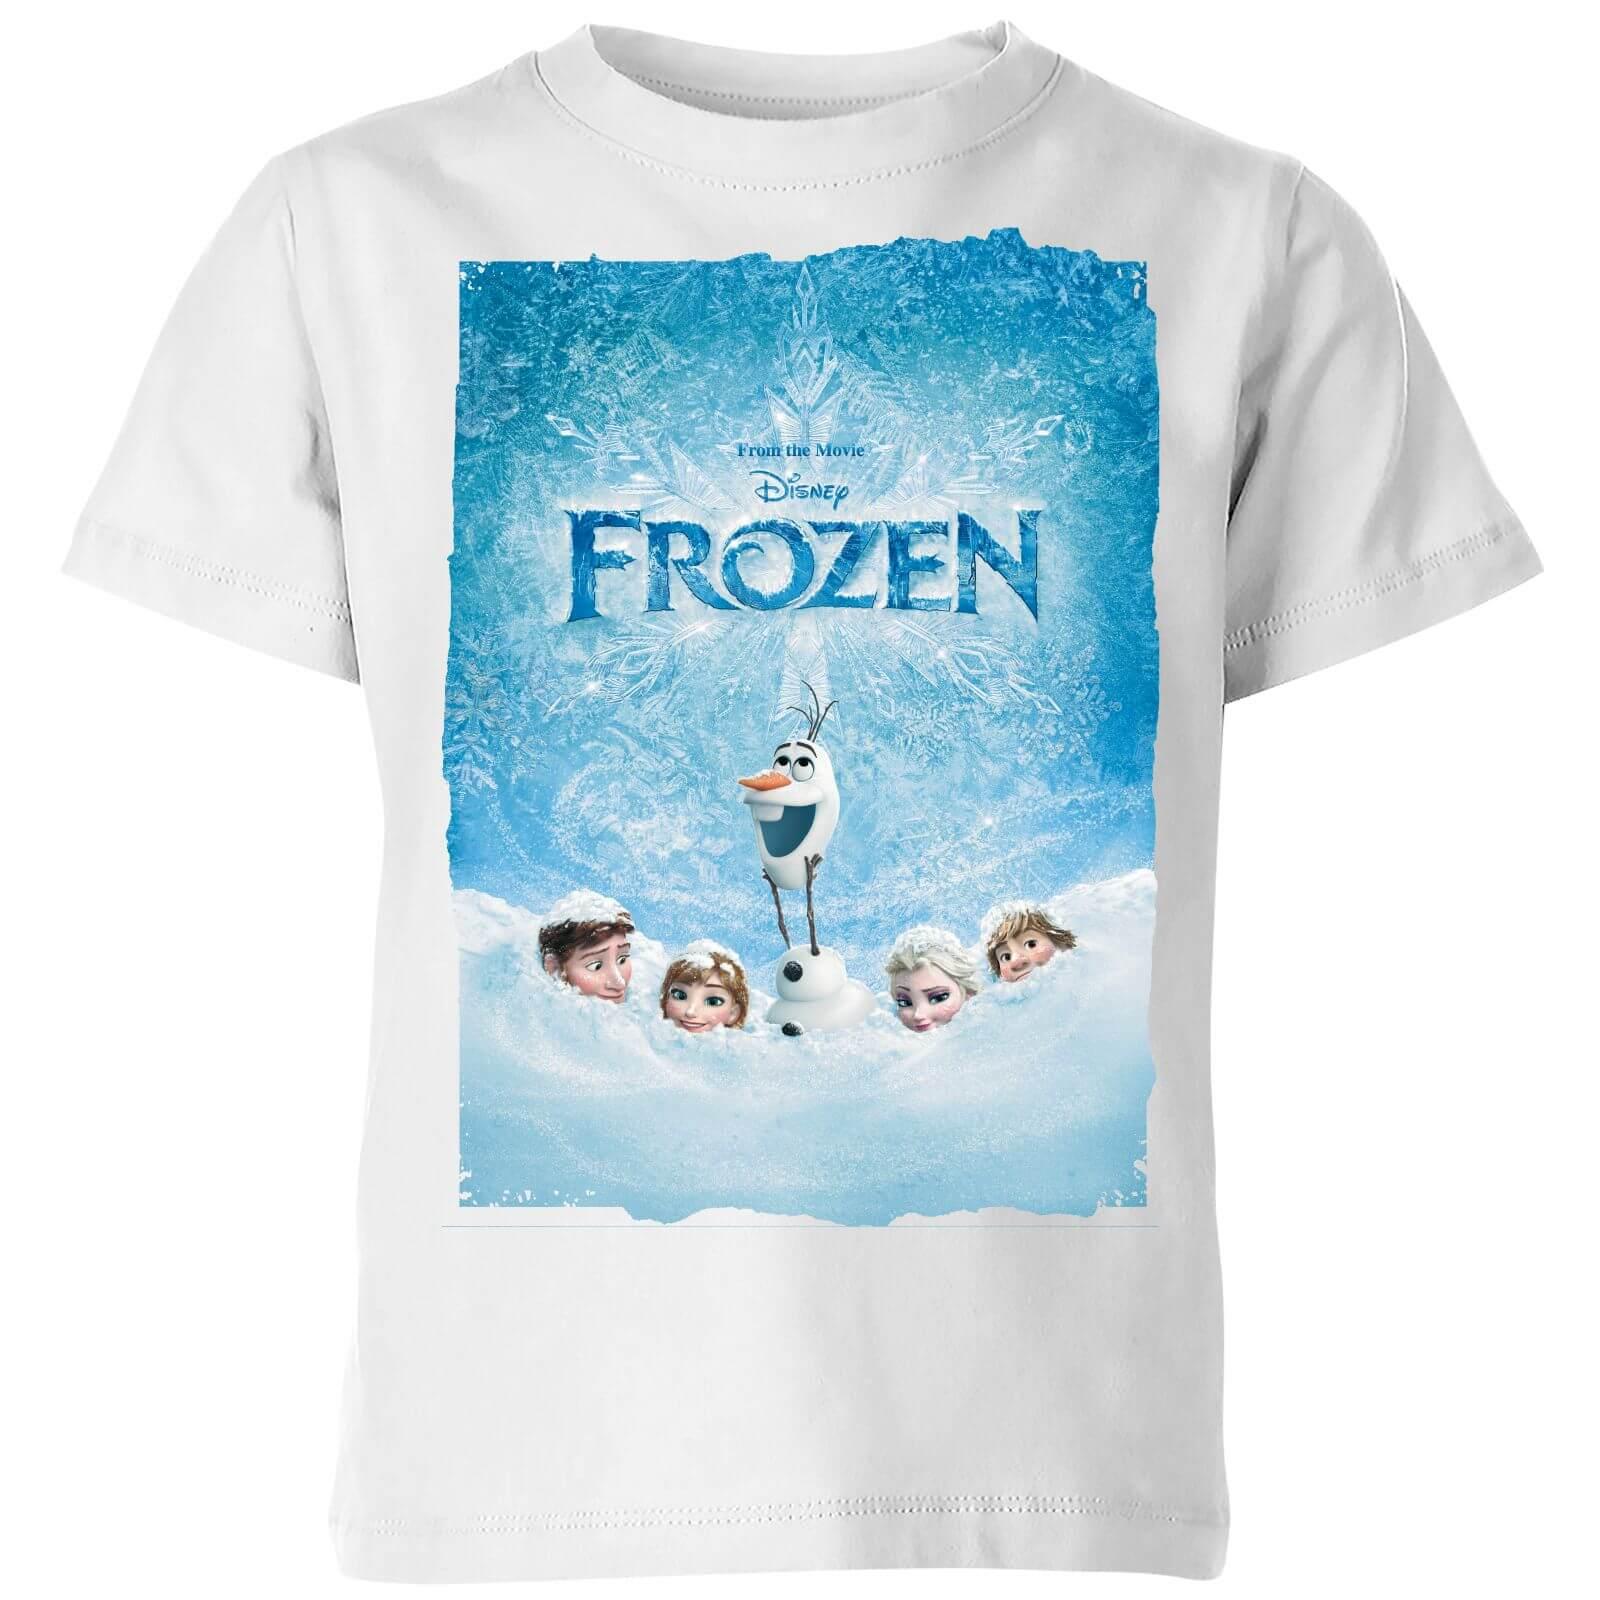 3106878c0 Camiseta Disney Frozen Póster - Niño - Blanco Clothing